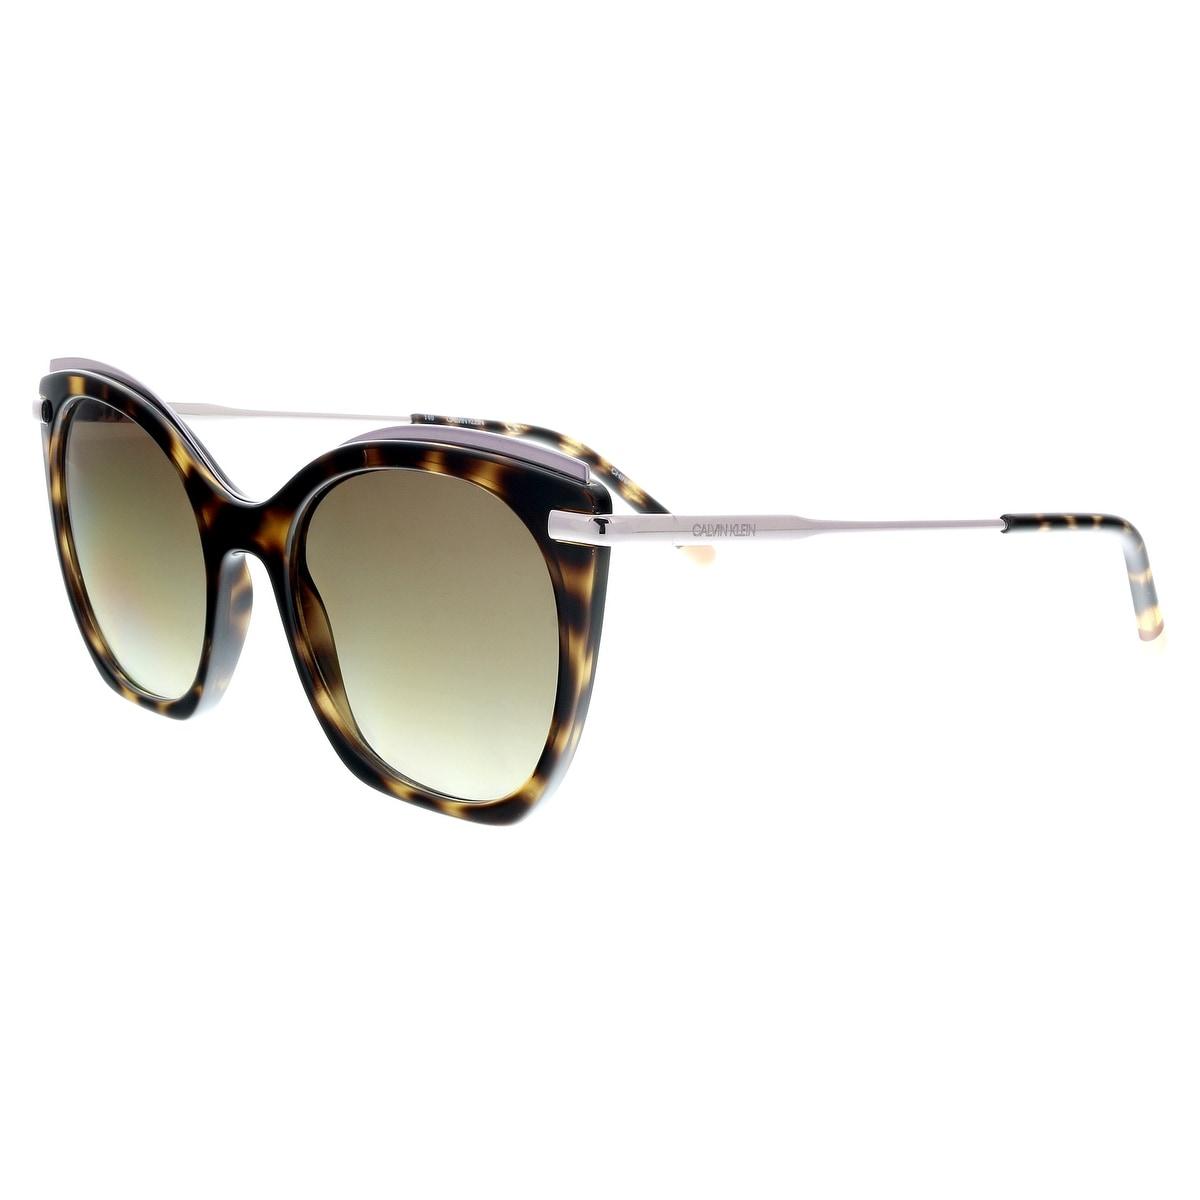 a8eeb066c734 Calvin Klein Women's Sunglasses | Find Great Sunglasses Deals Shopping at  Overstock